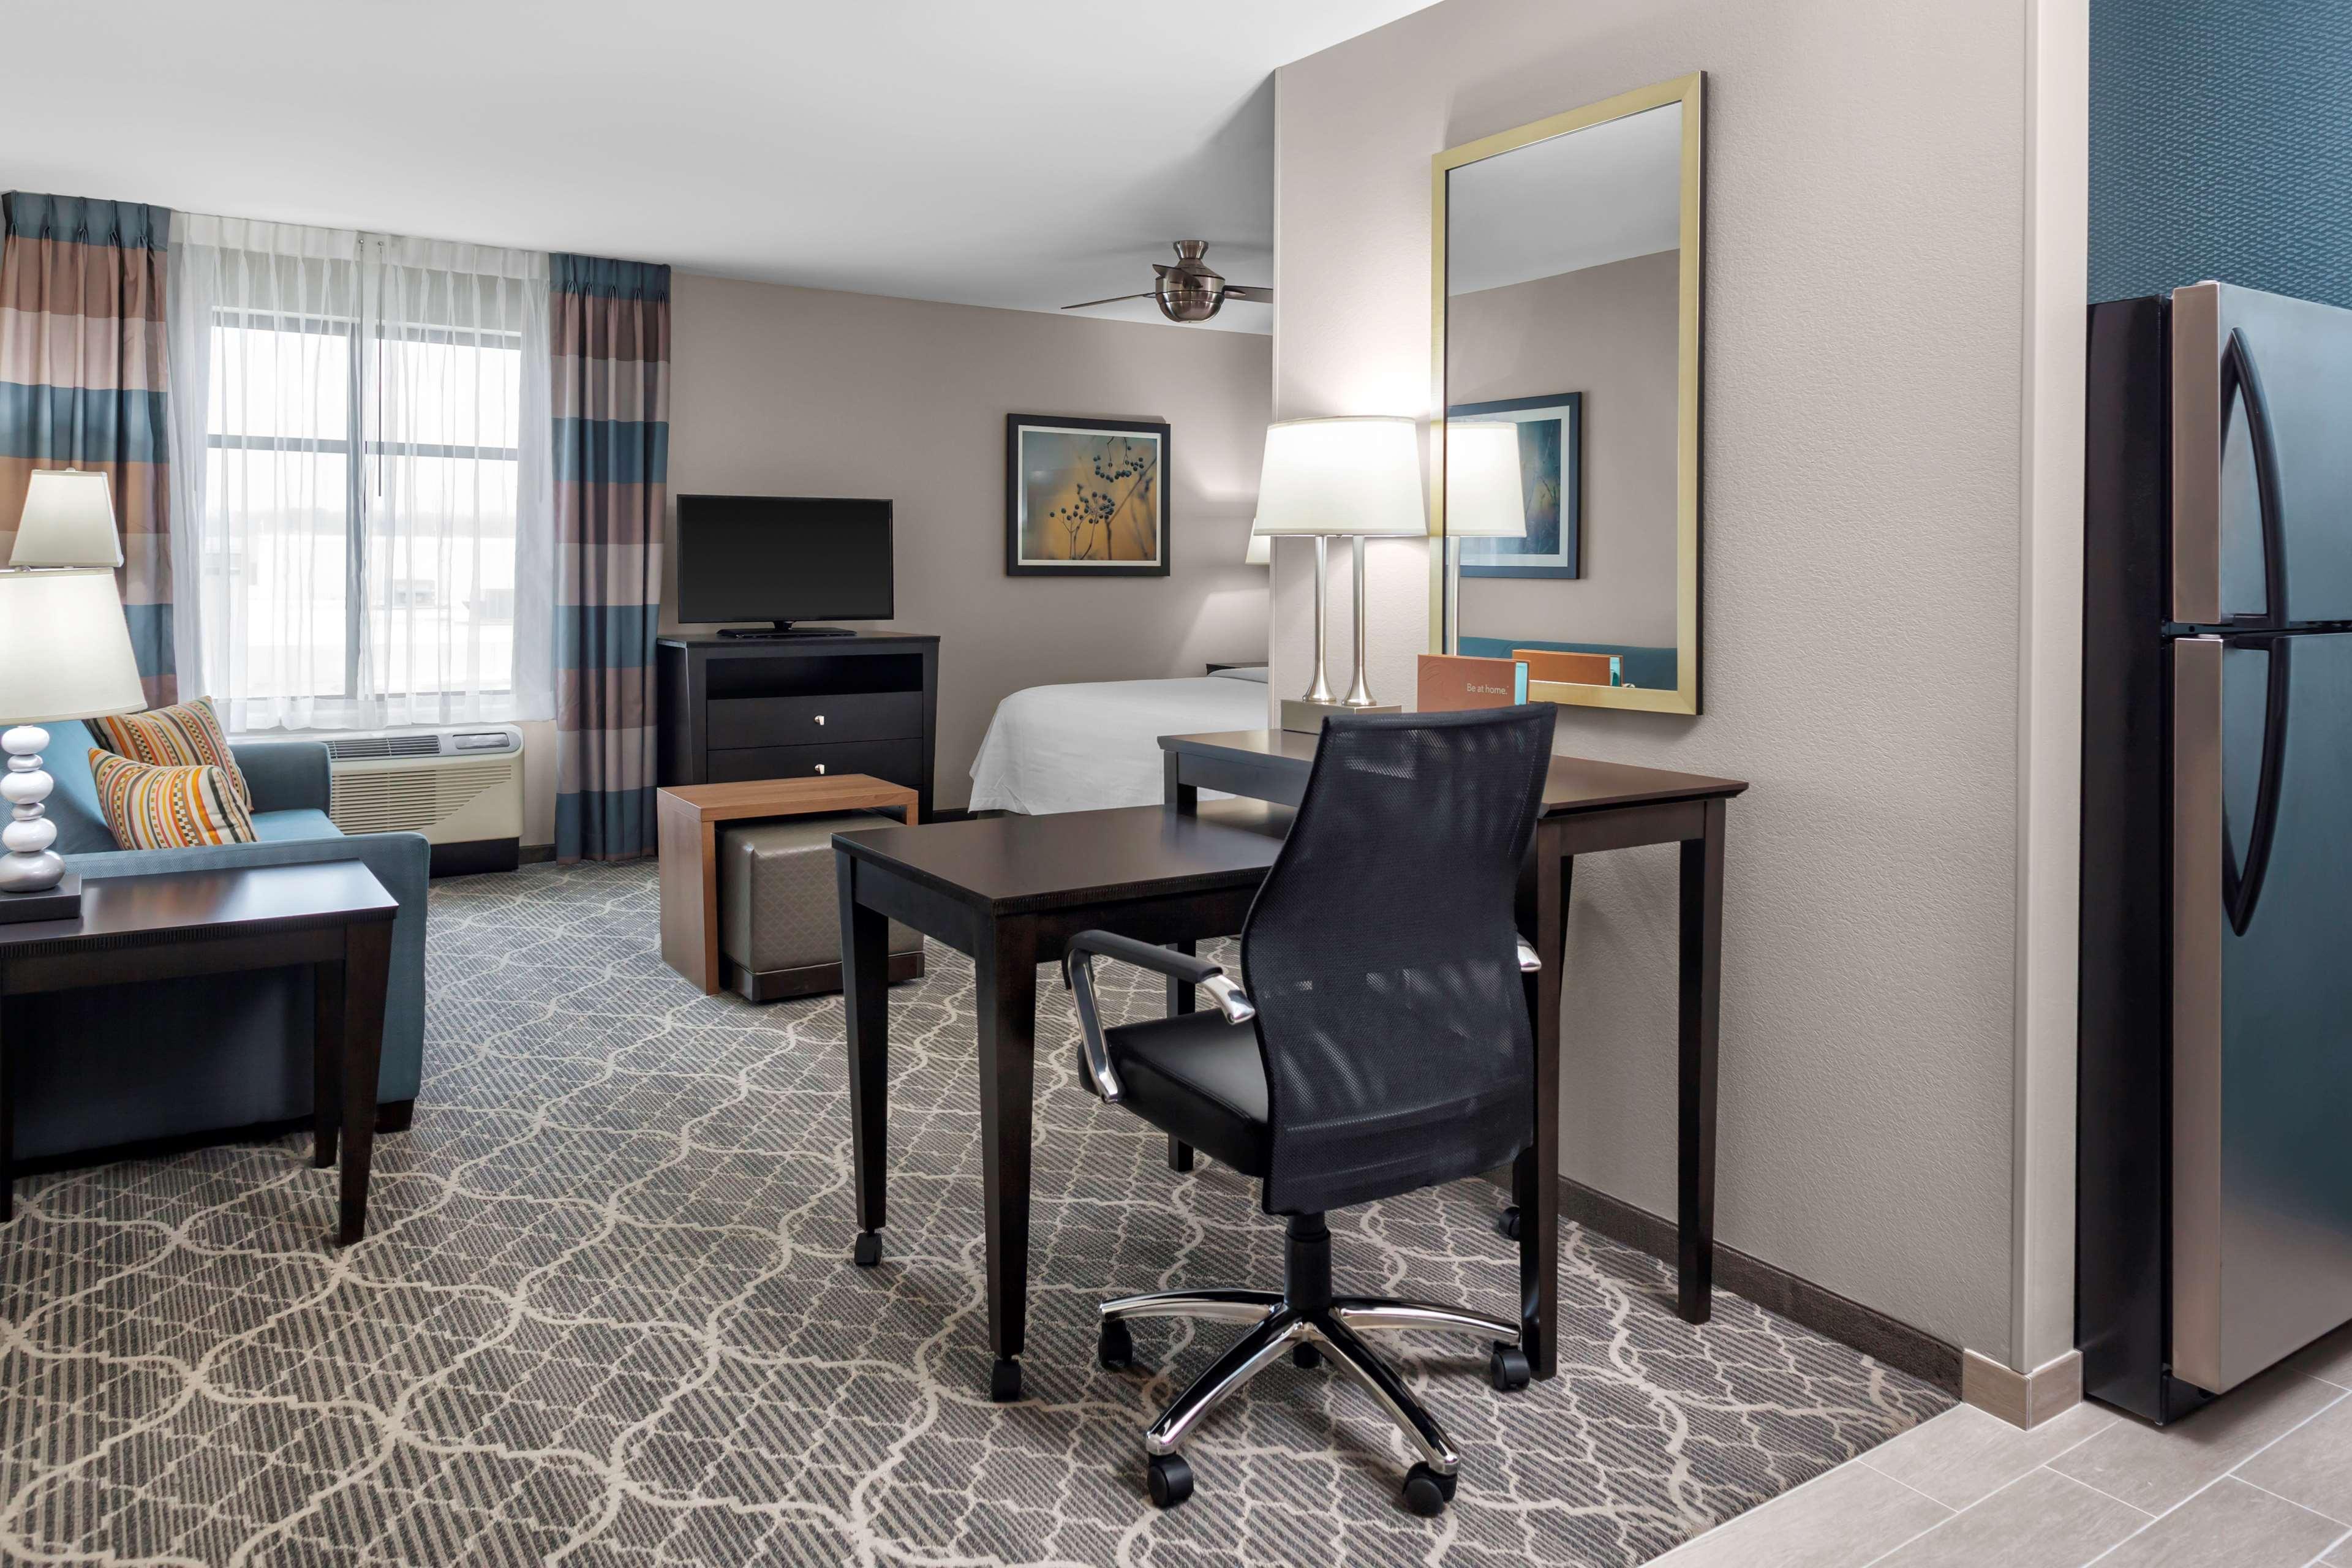 Homewood Suites by Hilton Wauwatosa Milwaukee image 23